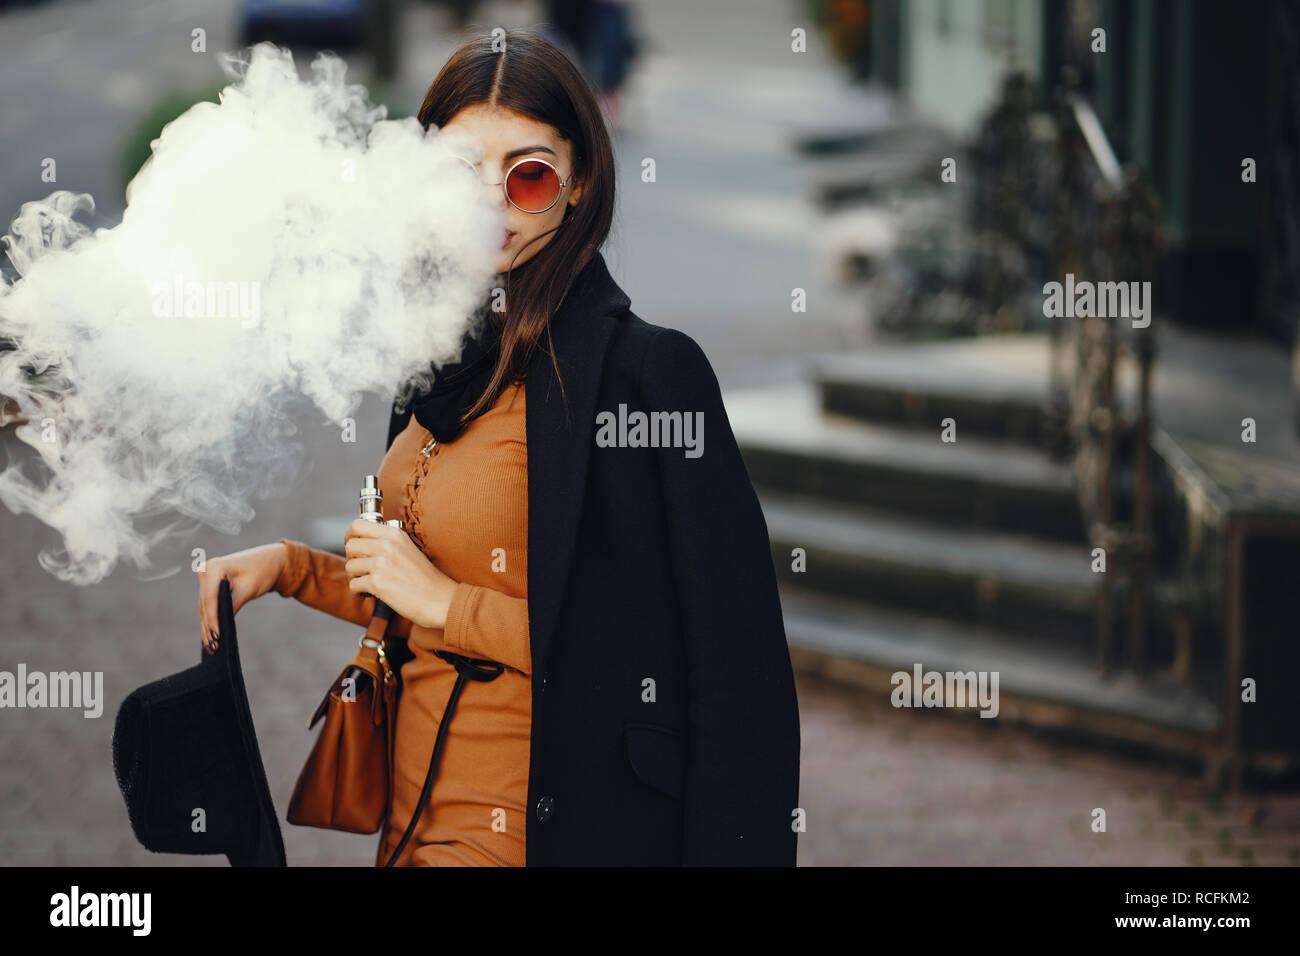 stylish girl smoking an e-cigarette - Stock Image